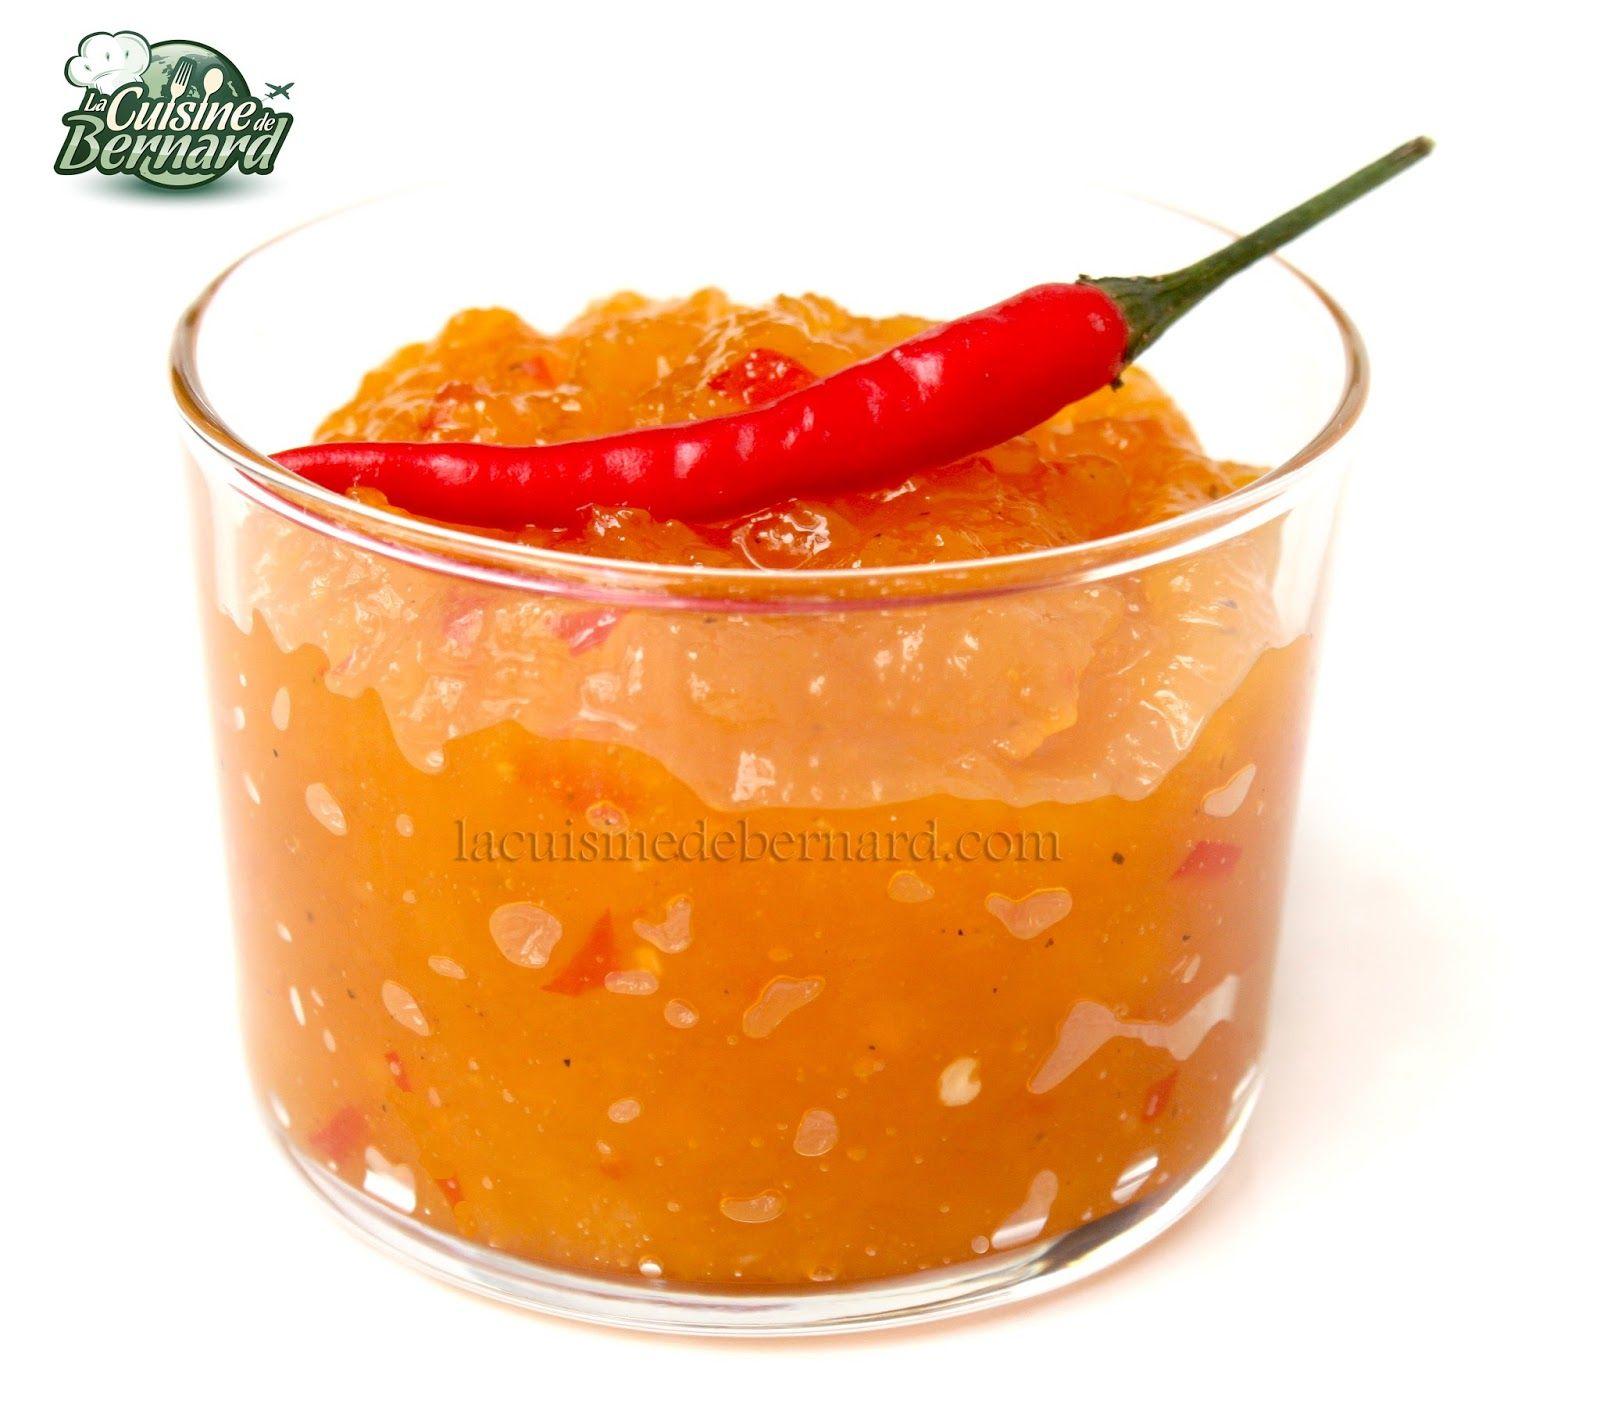 La cuisine de bernard le chutney de mangue l gumes for La cuisine de bernard